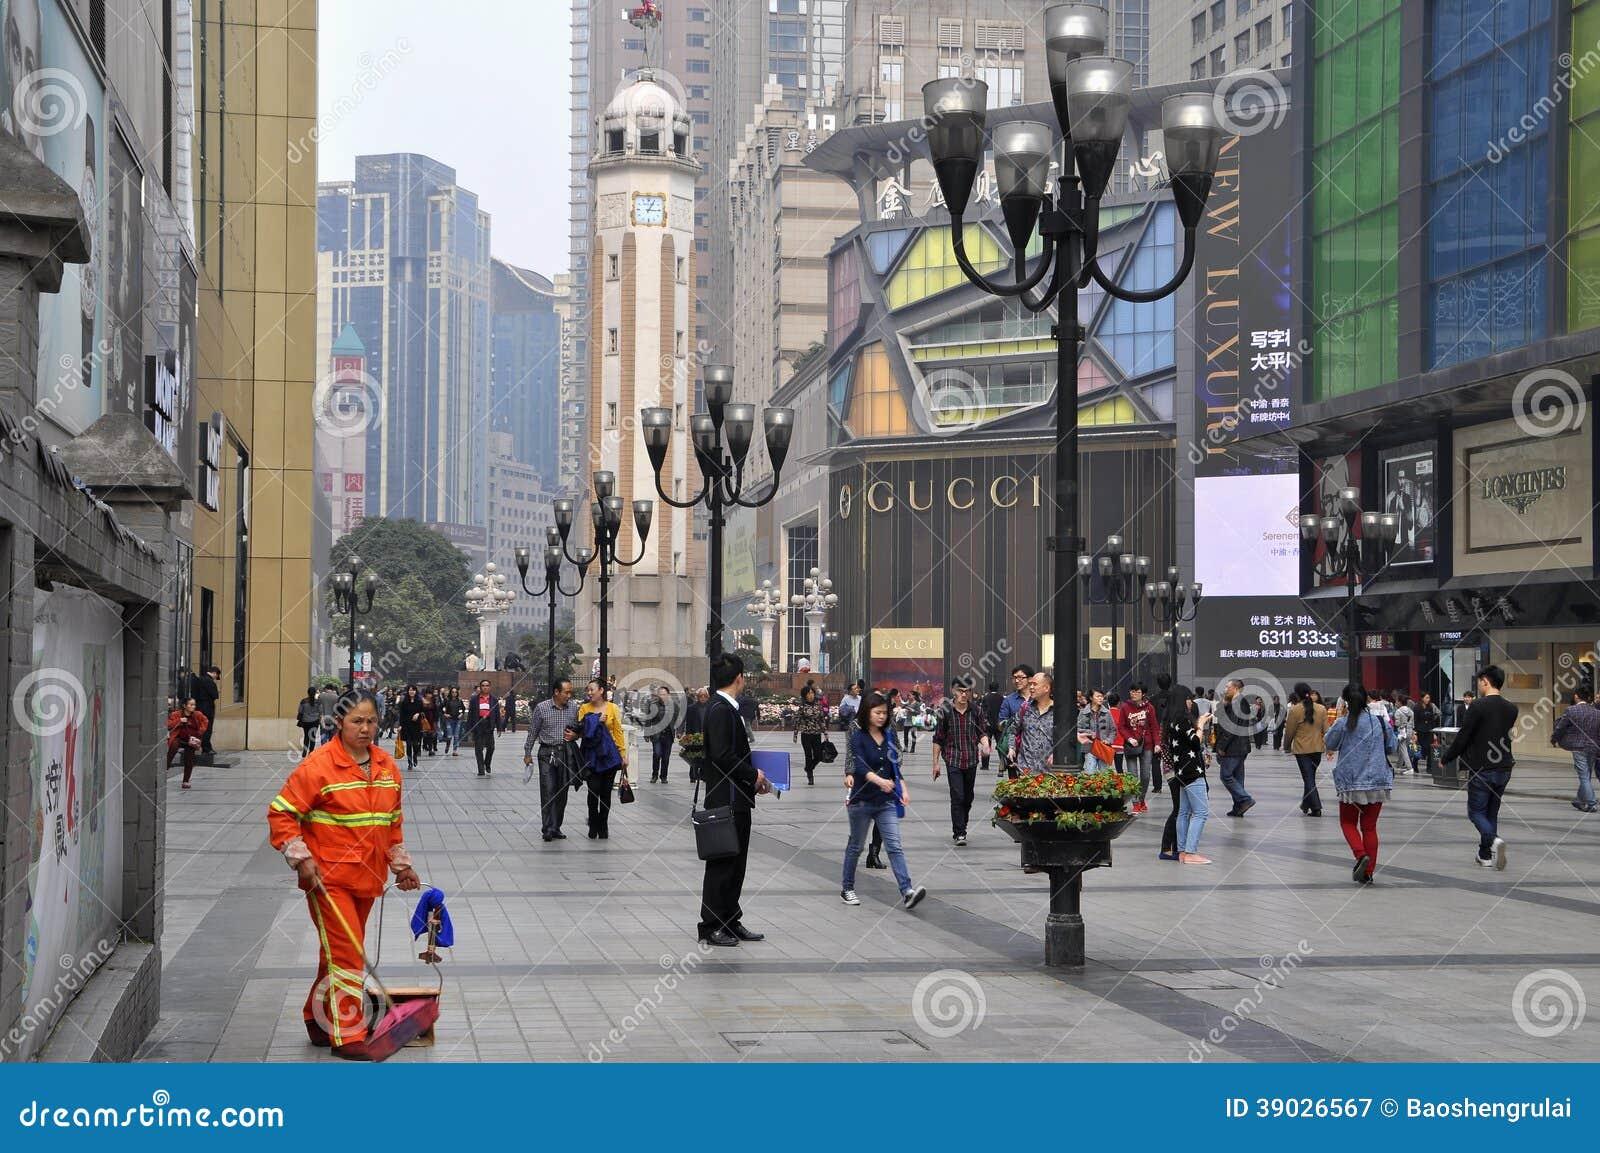 China Chongqing GUCCI Store Editorial Photography - Image ...